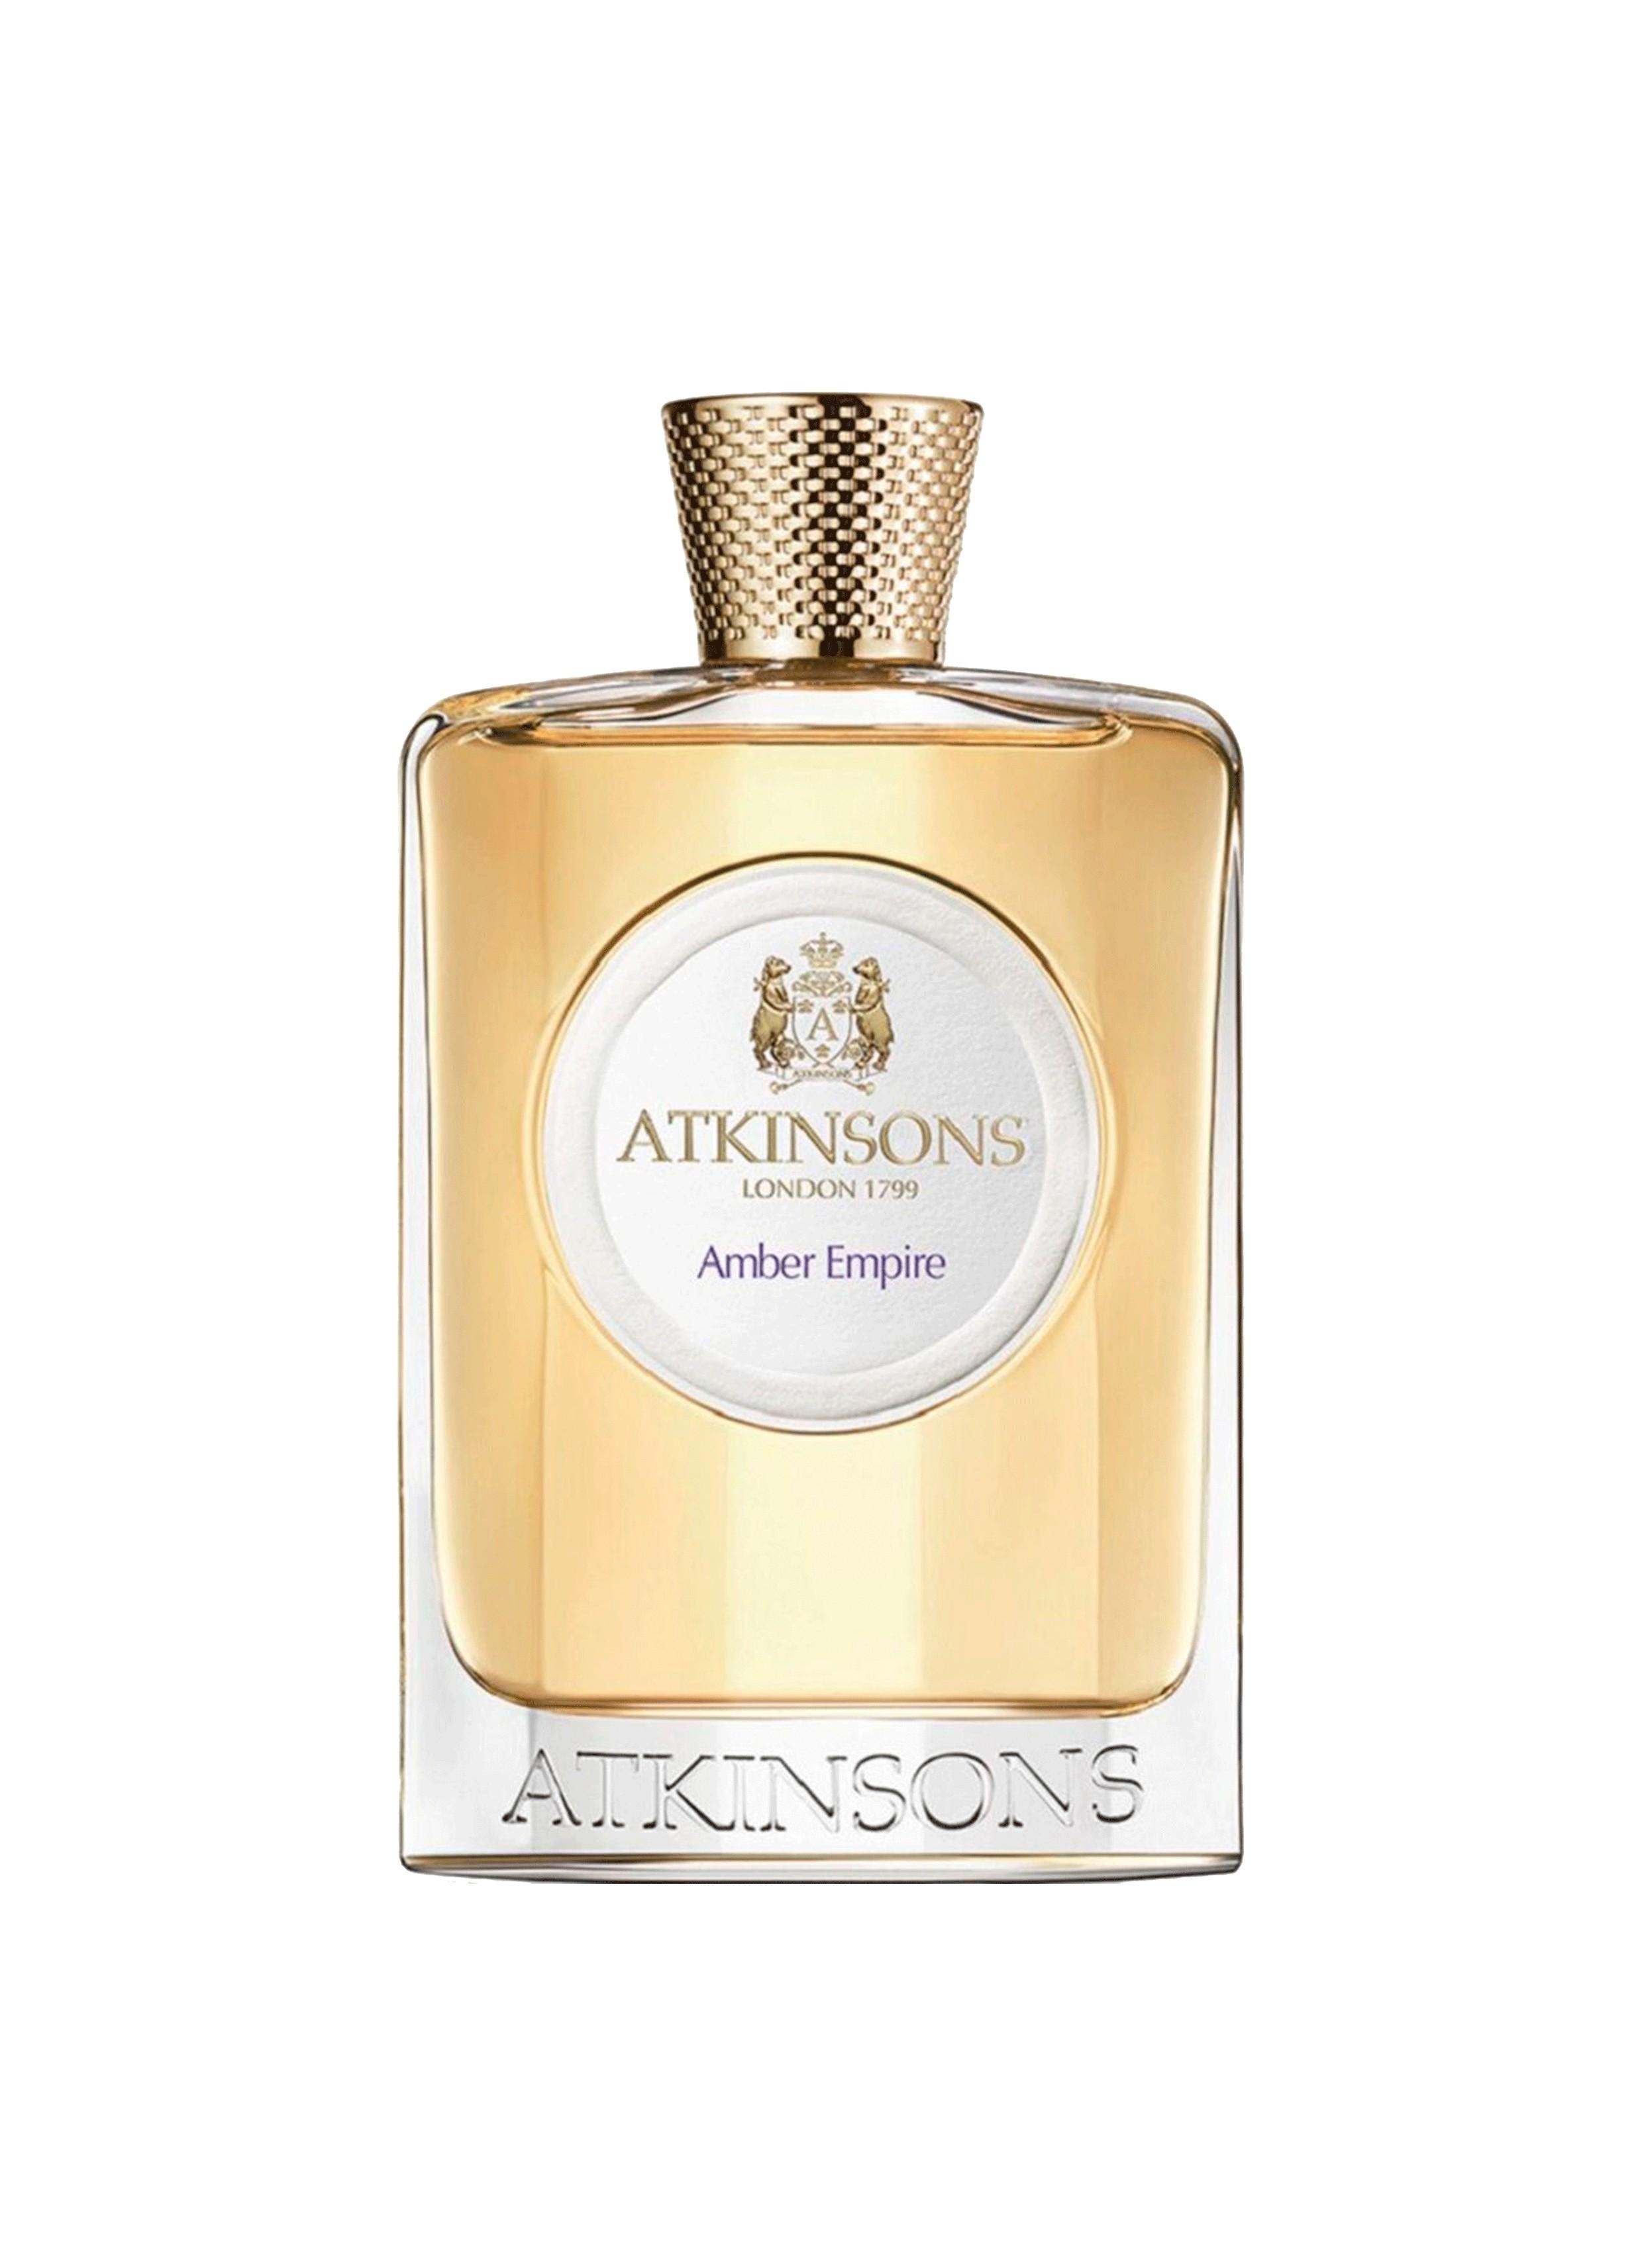 Flacon parfum ATKINSONS Amber Empire www.atkinsons1799.com